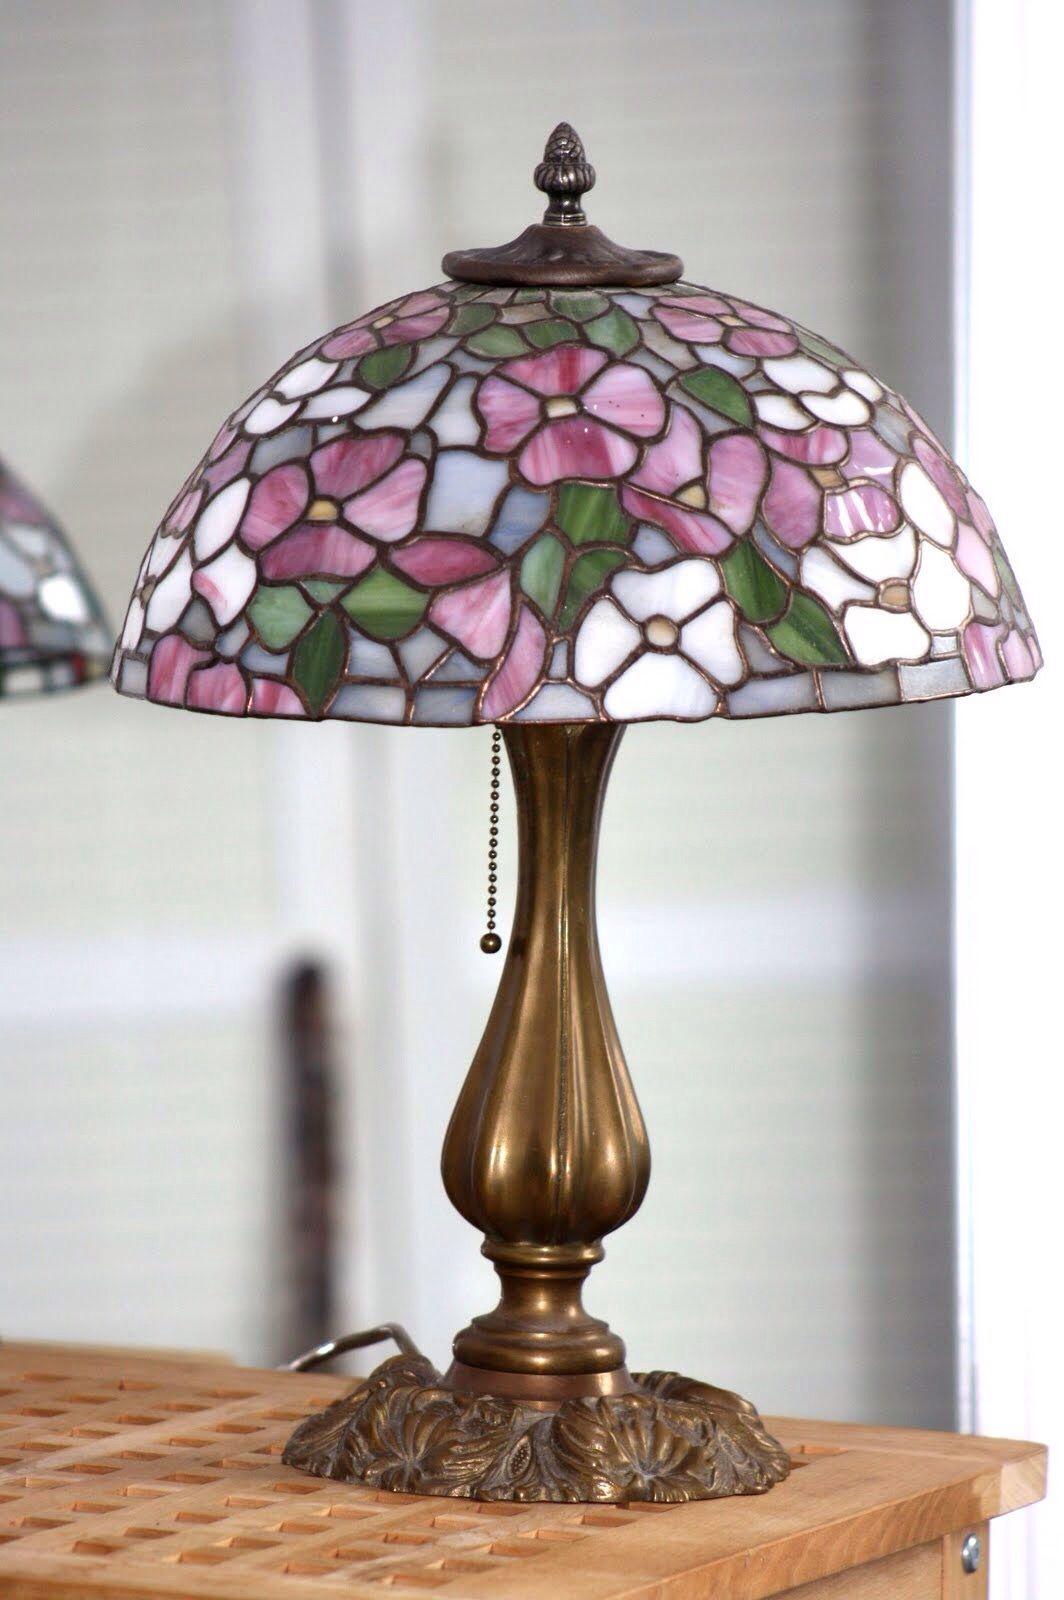 Stunning Ideas Lamp Shades Chandelier Decor Bell Lamp Shades Lamp Shades Black Tom Dixon W With Images Stained Glass Lamp Shades Glass Lamp Shade Contemporary Lamp Shades